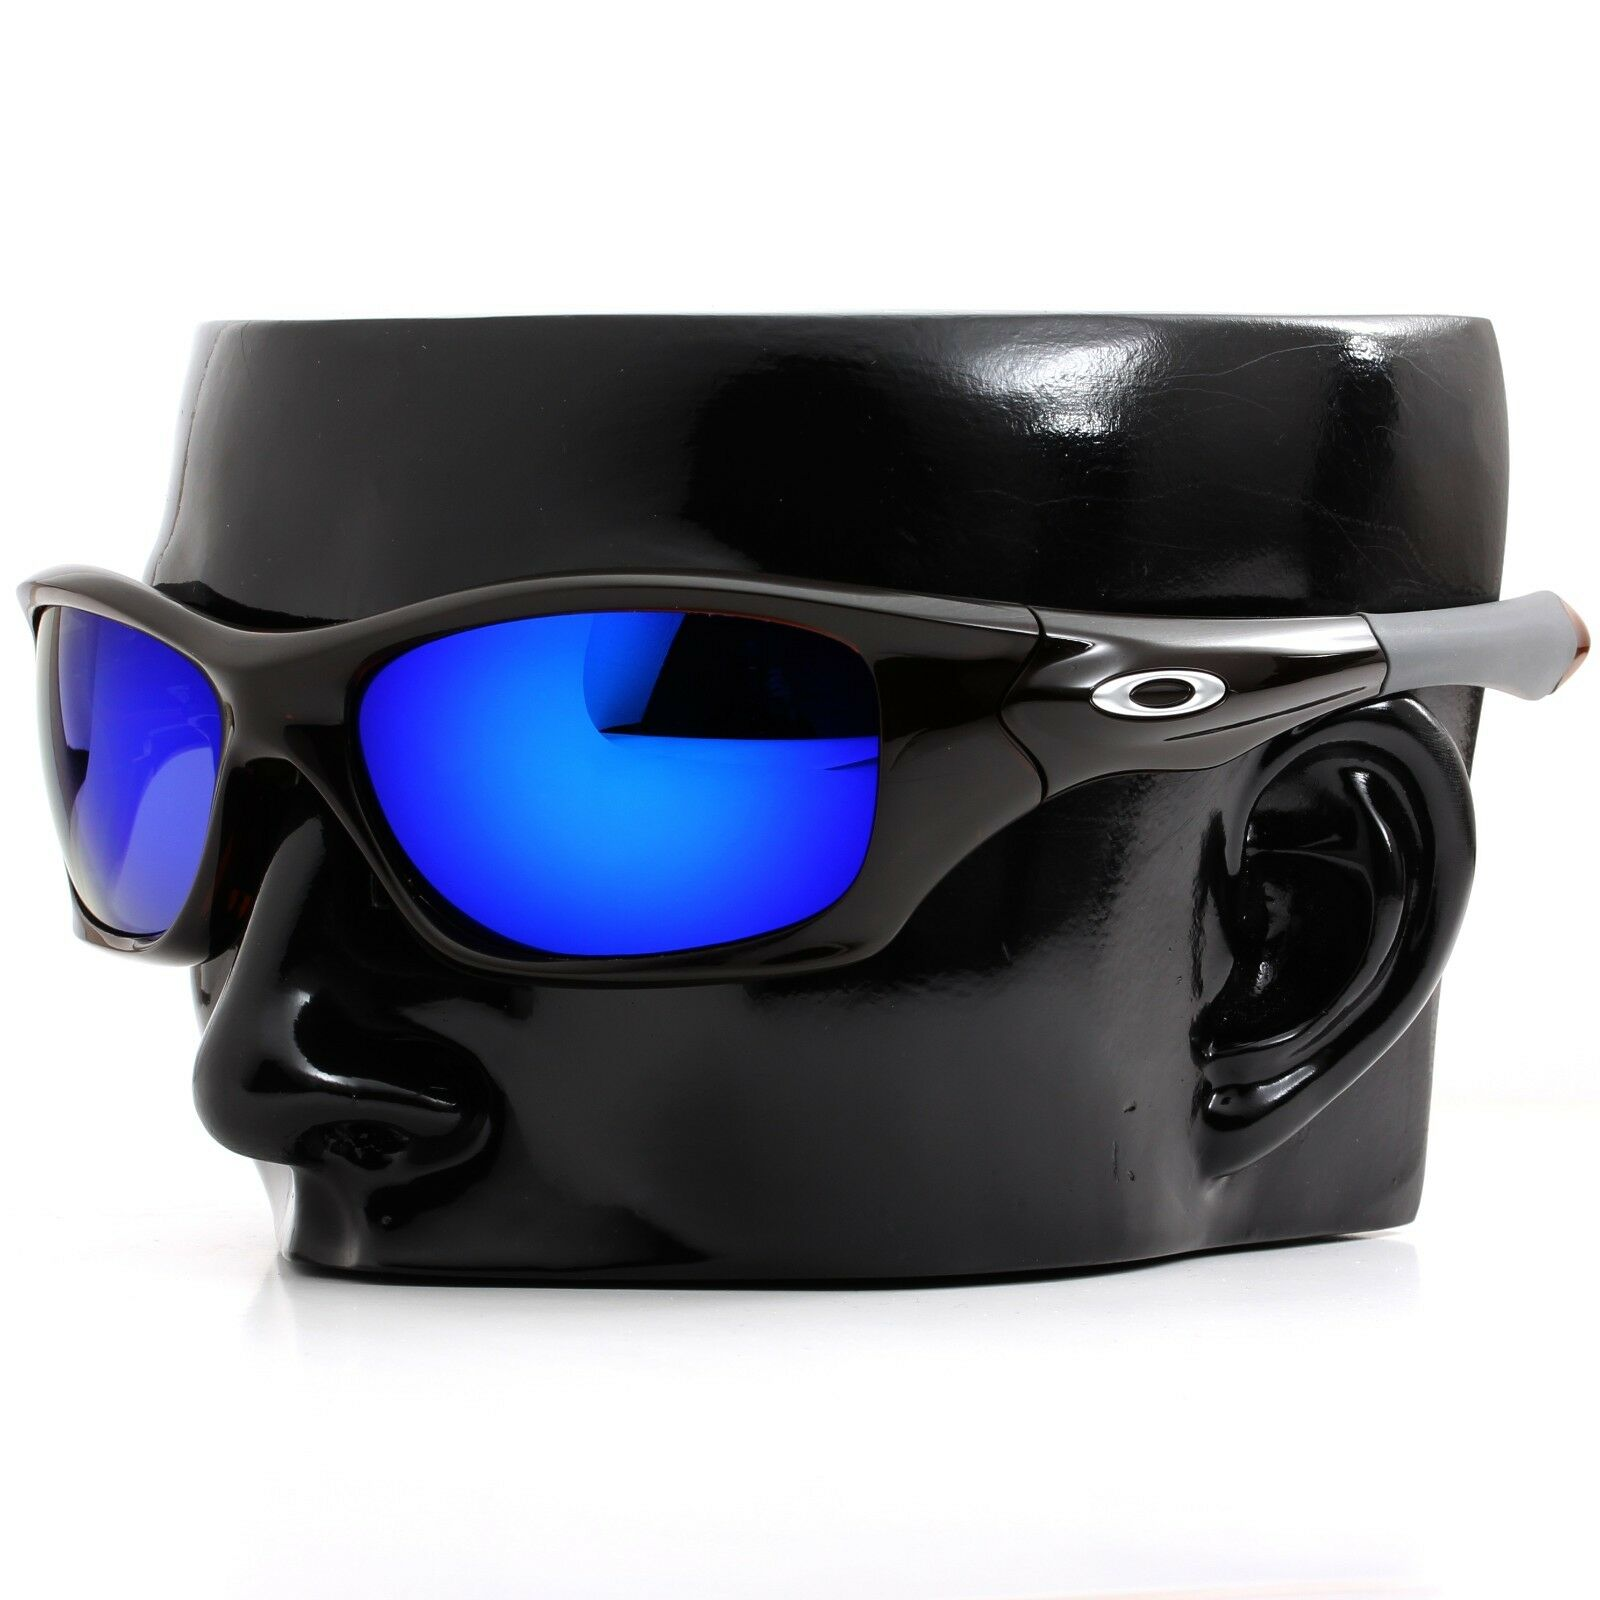 1e57265051 Polarized IKON Iridium Replacement Lenses For Oakley Pit bull Deep Blue  Mirror